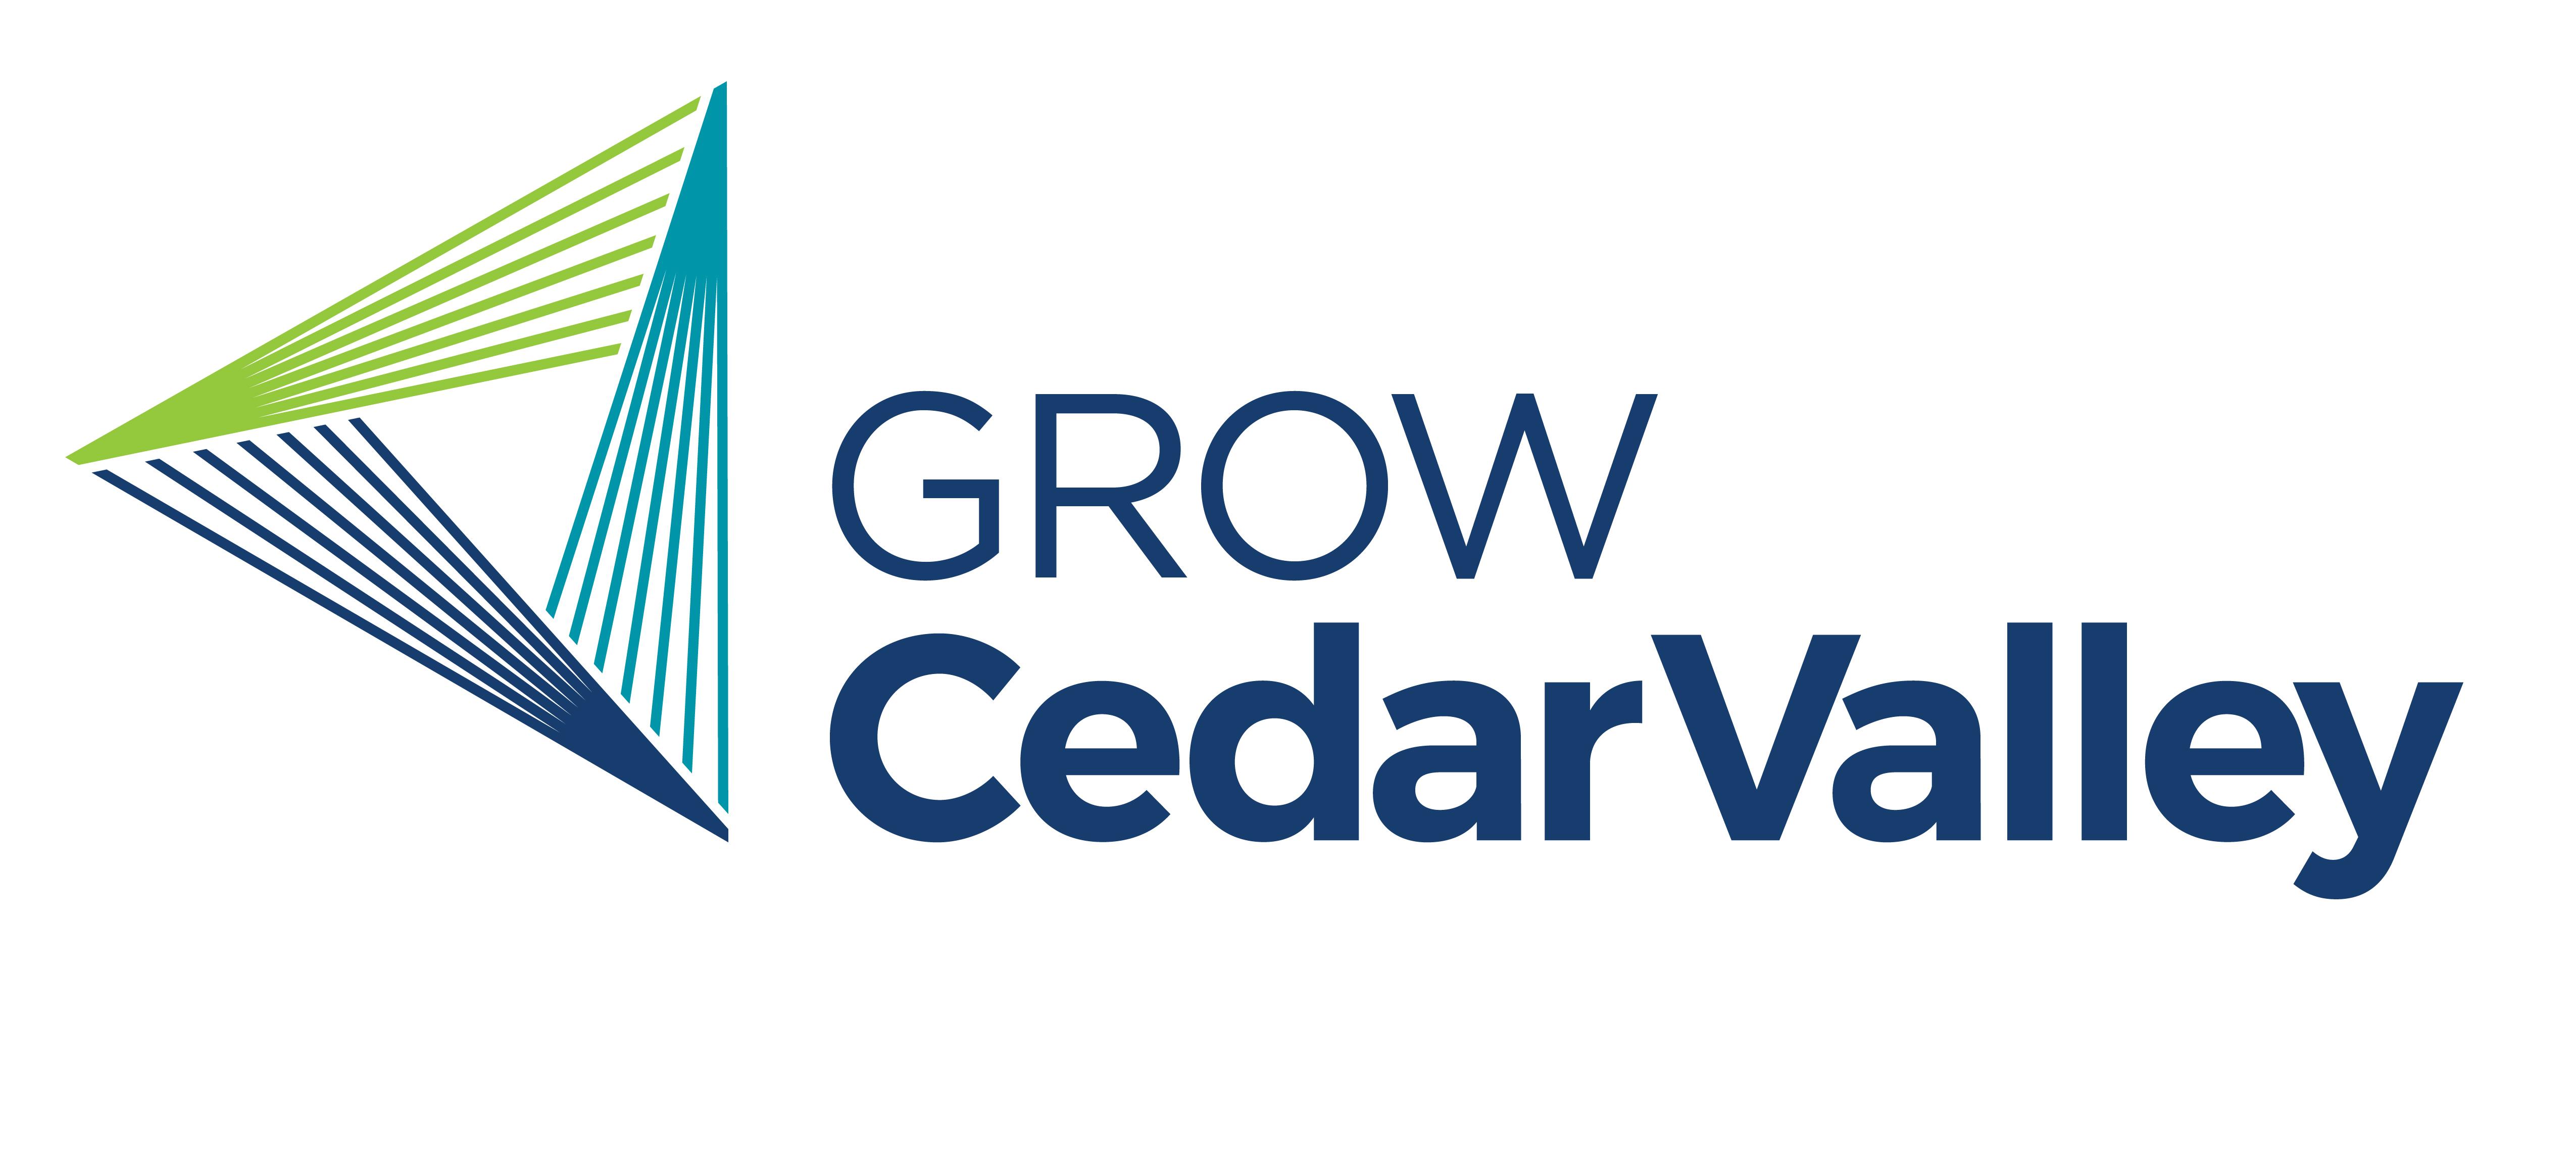 Grow Cedar Valley_Final_Grow Cedar Valley_Horizontal_Full Color